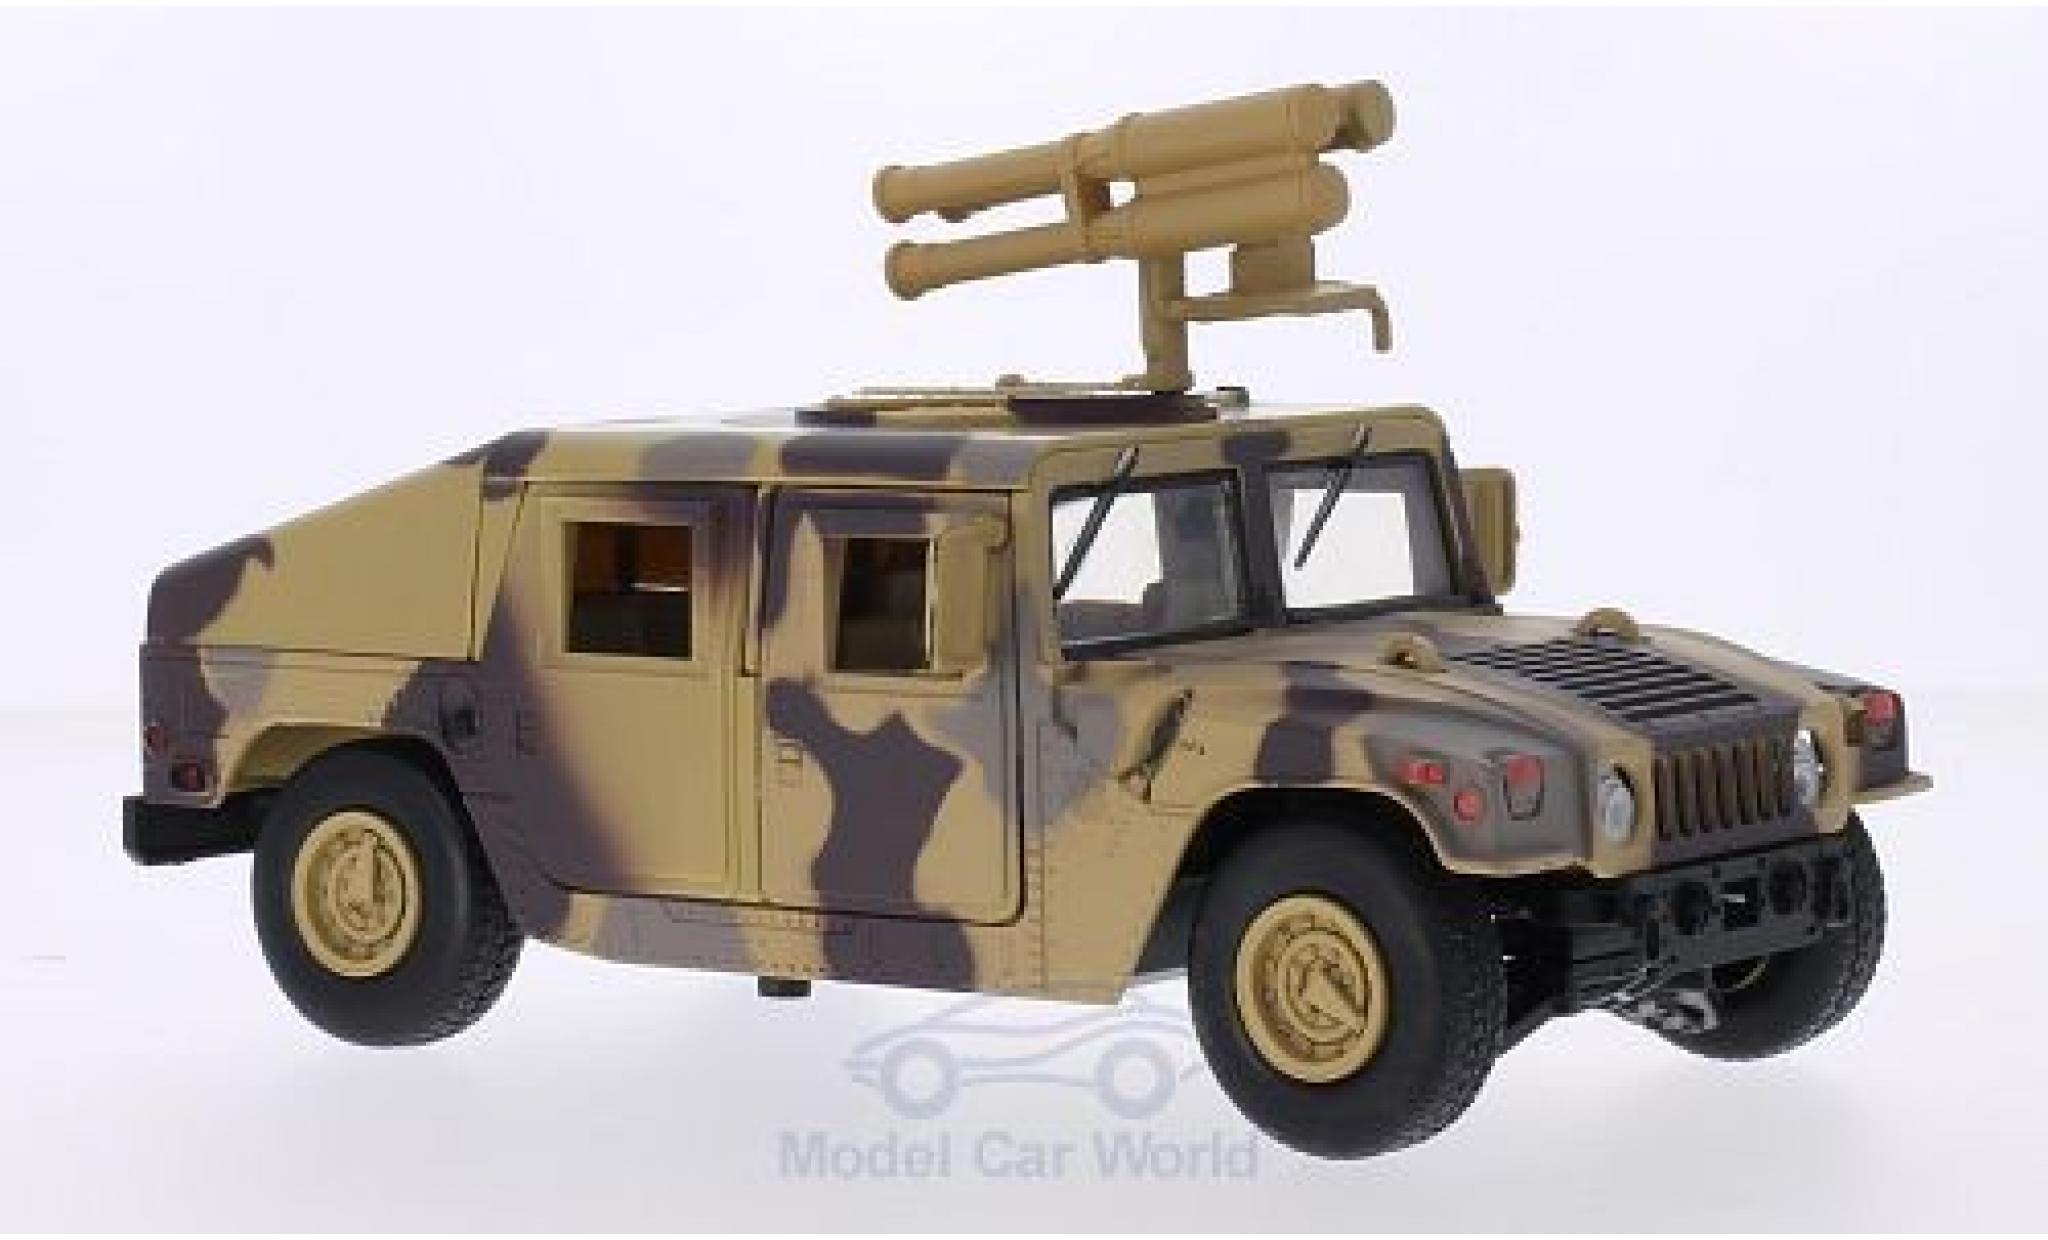 Hummer Humvee 1/24 Motormax mit Starburst Raketenwerfer camouflage